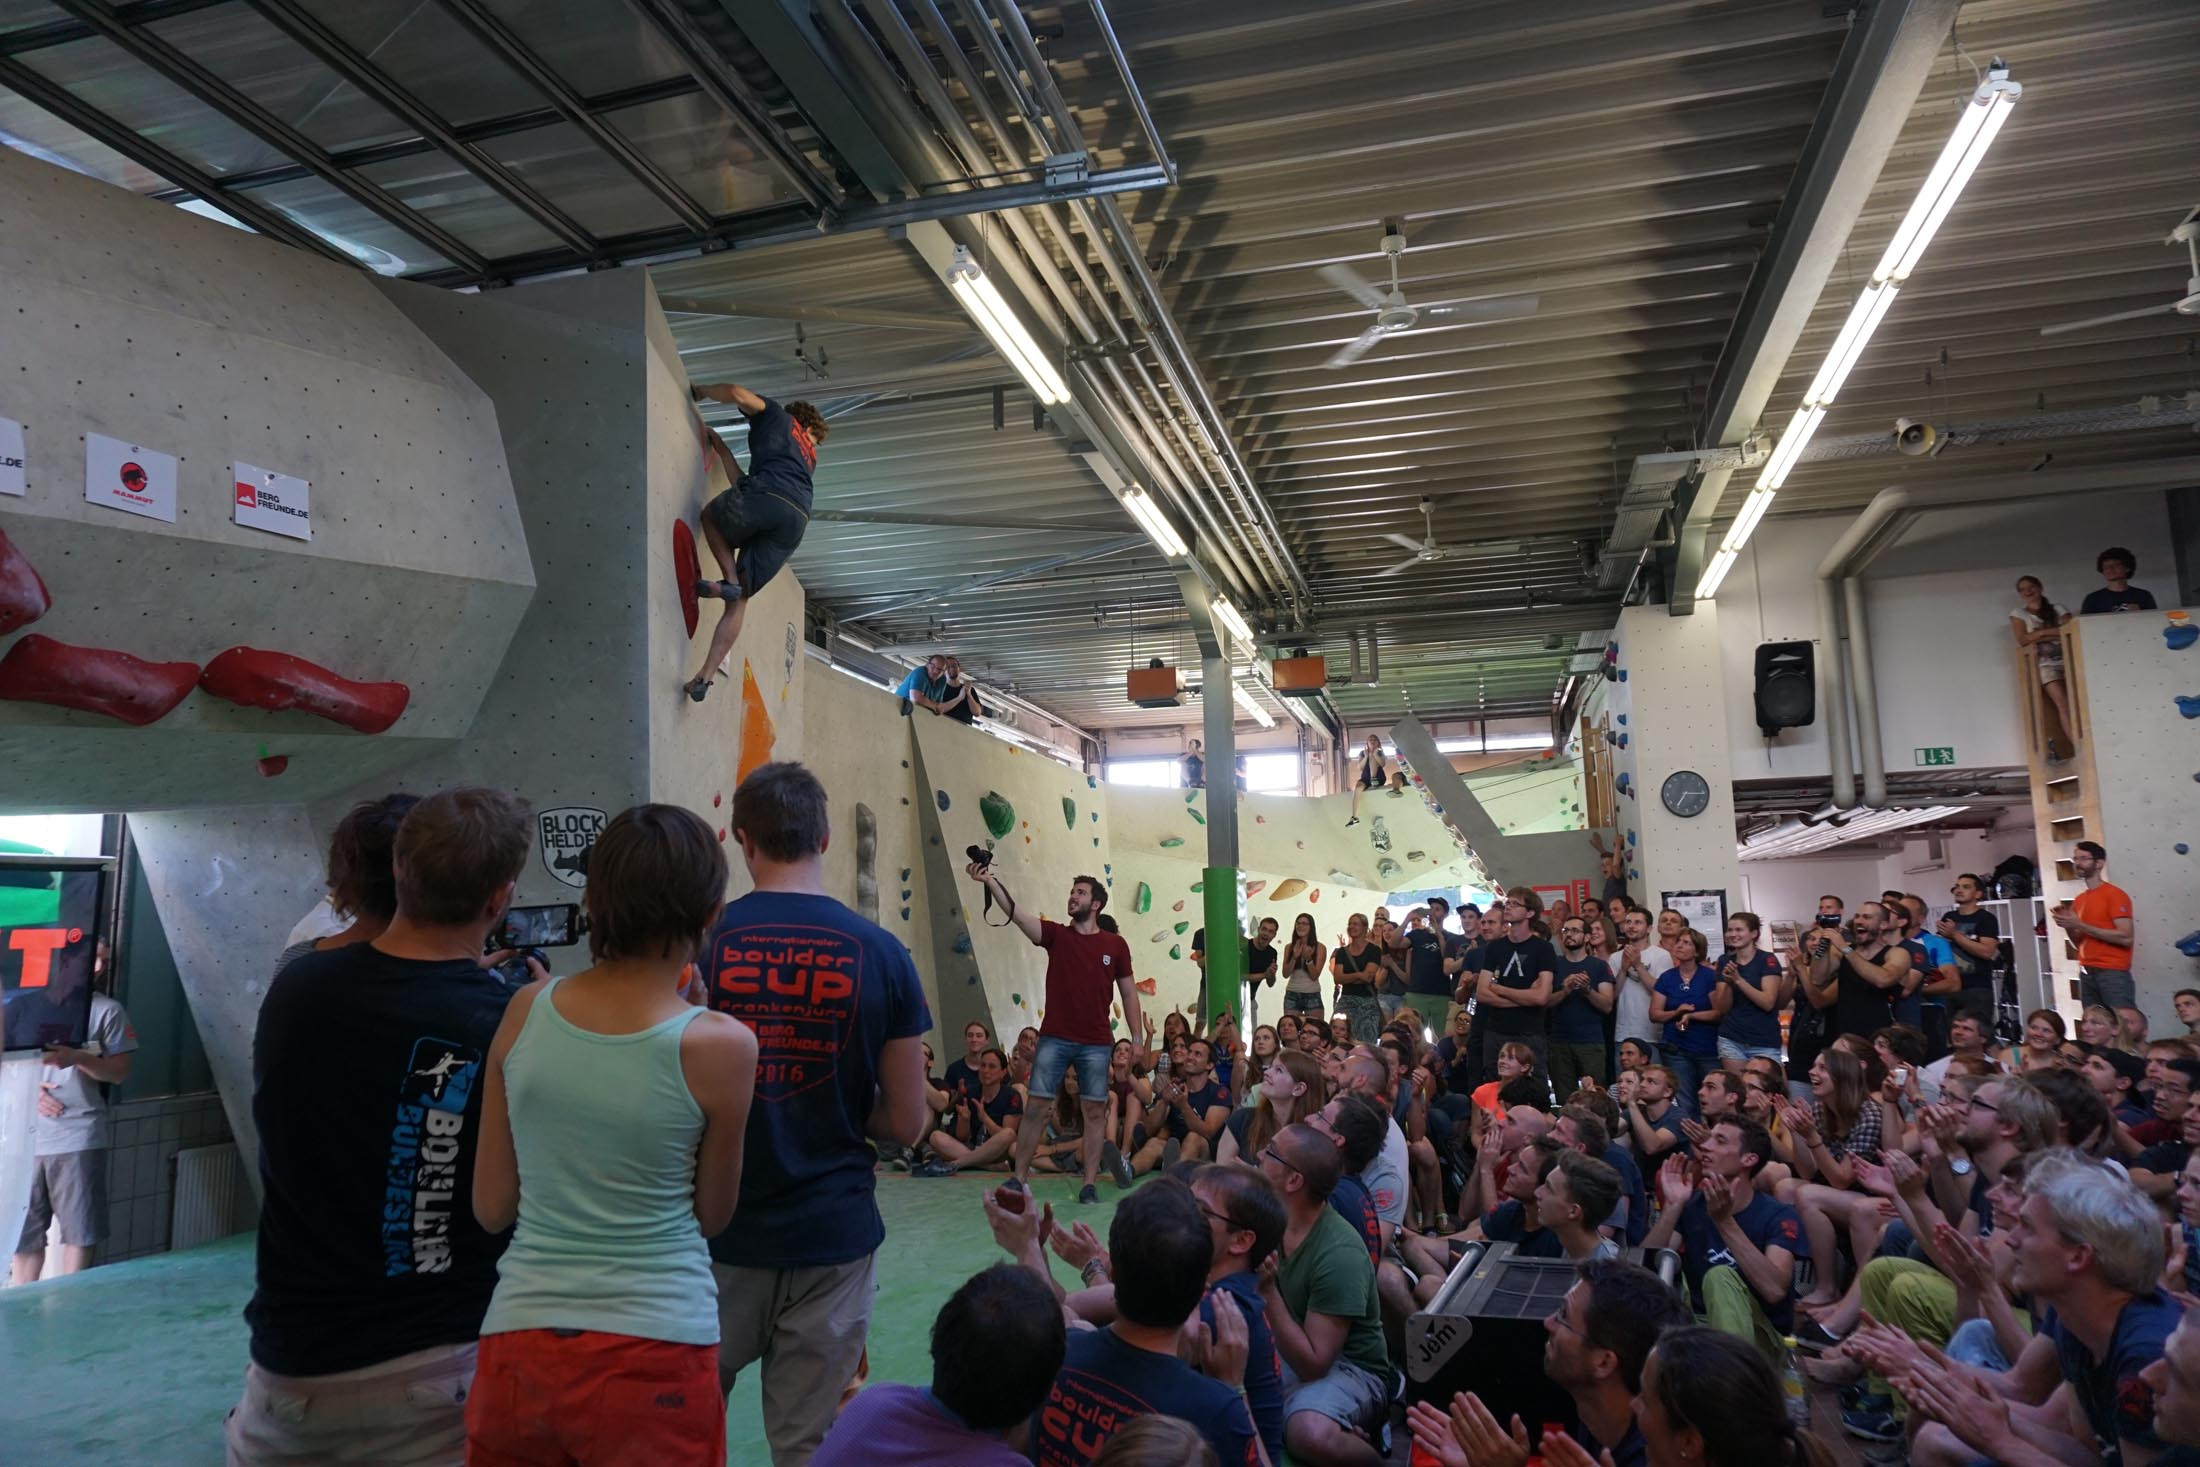 Finale, internationaler bouldercup Frankenjura 2016, BLOCKHELDEN Erlangen, Mammut, Bergfreunde.de, Boulderwettkampf07092016589